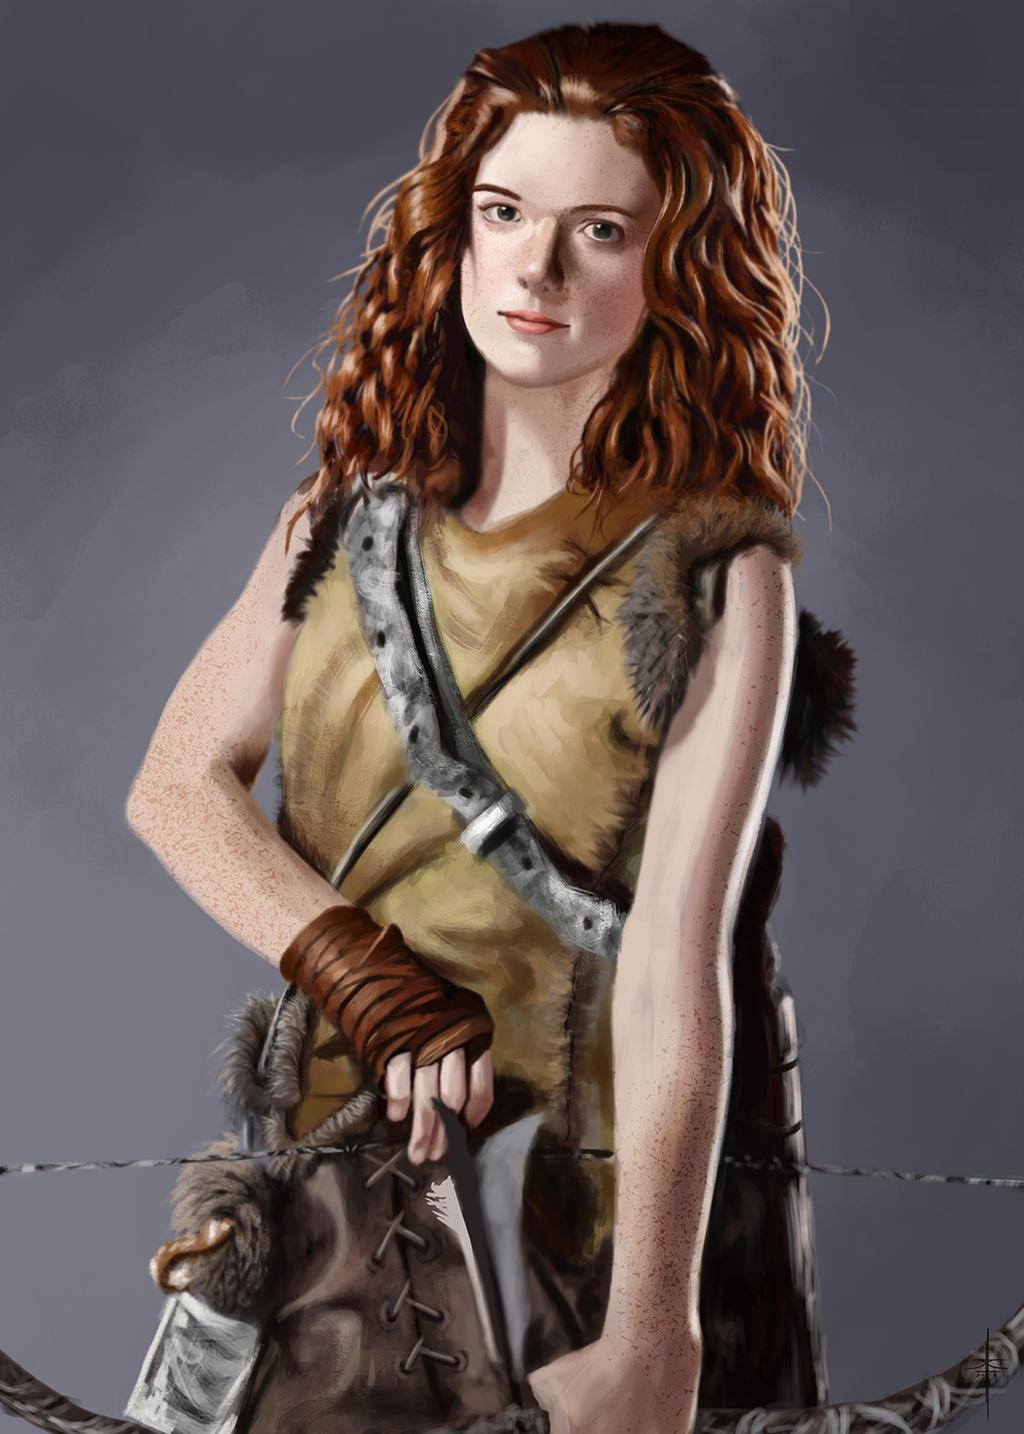 Amazon.com: ygritte costume